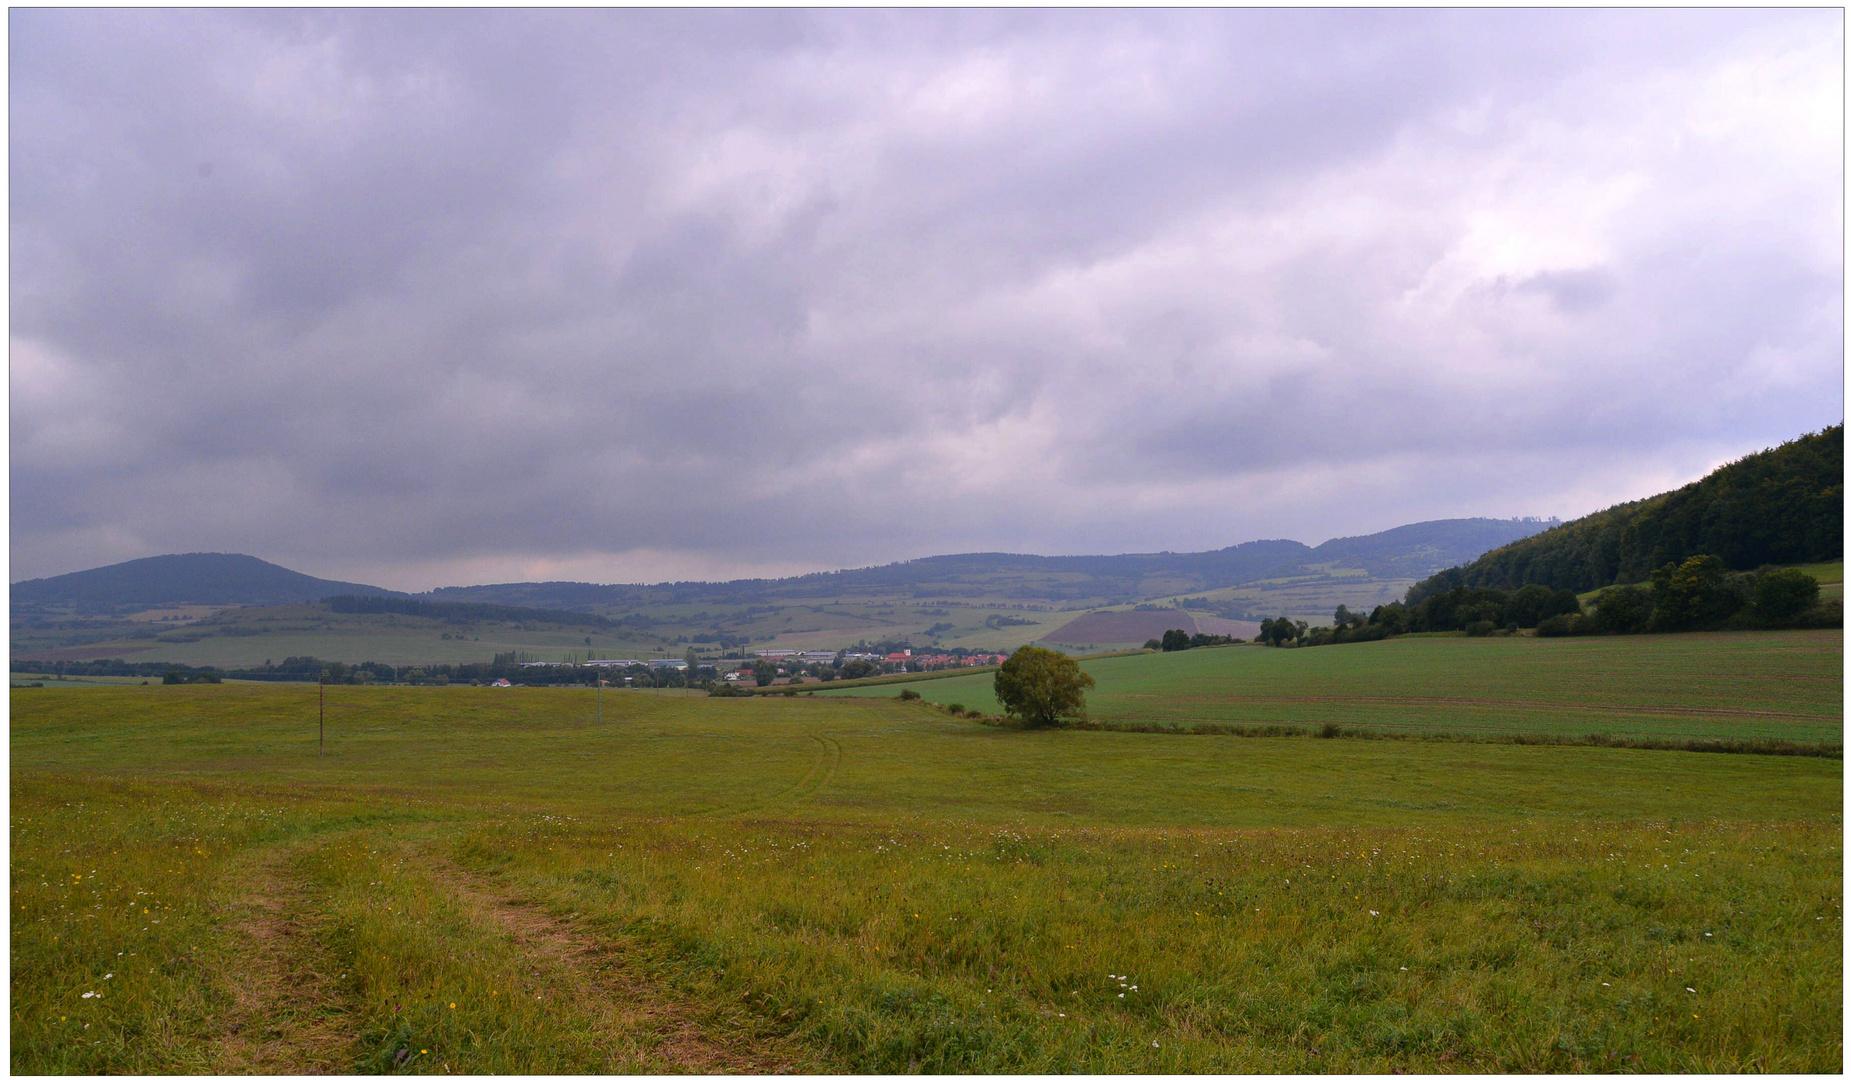 Panorama con vista a mi pueblo (Blick auf mein Dorf)